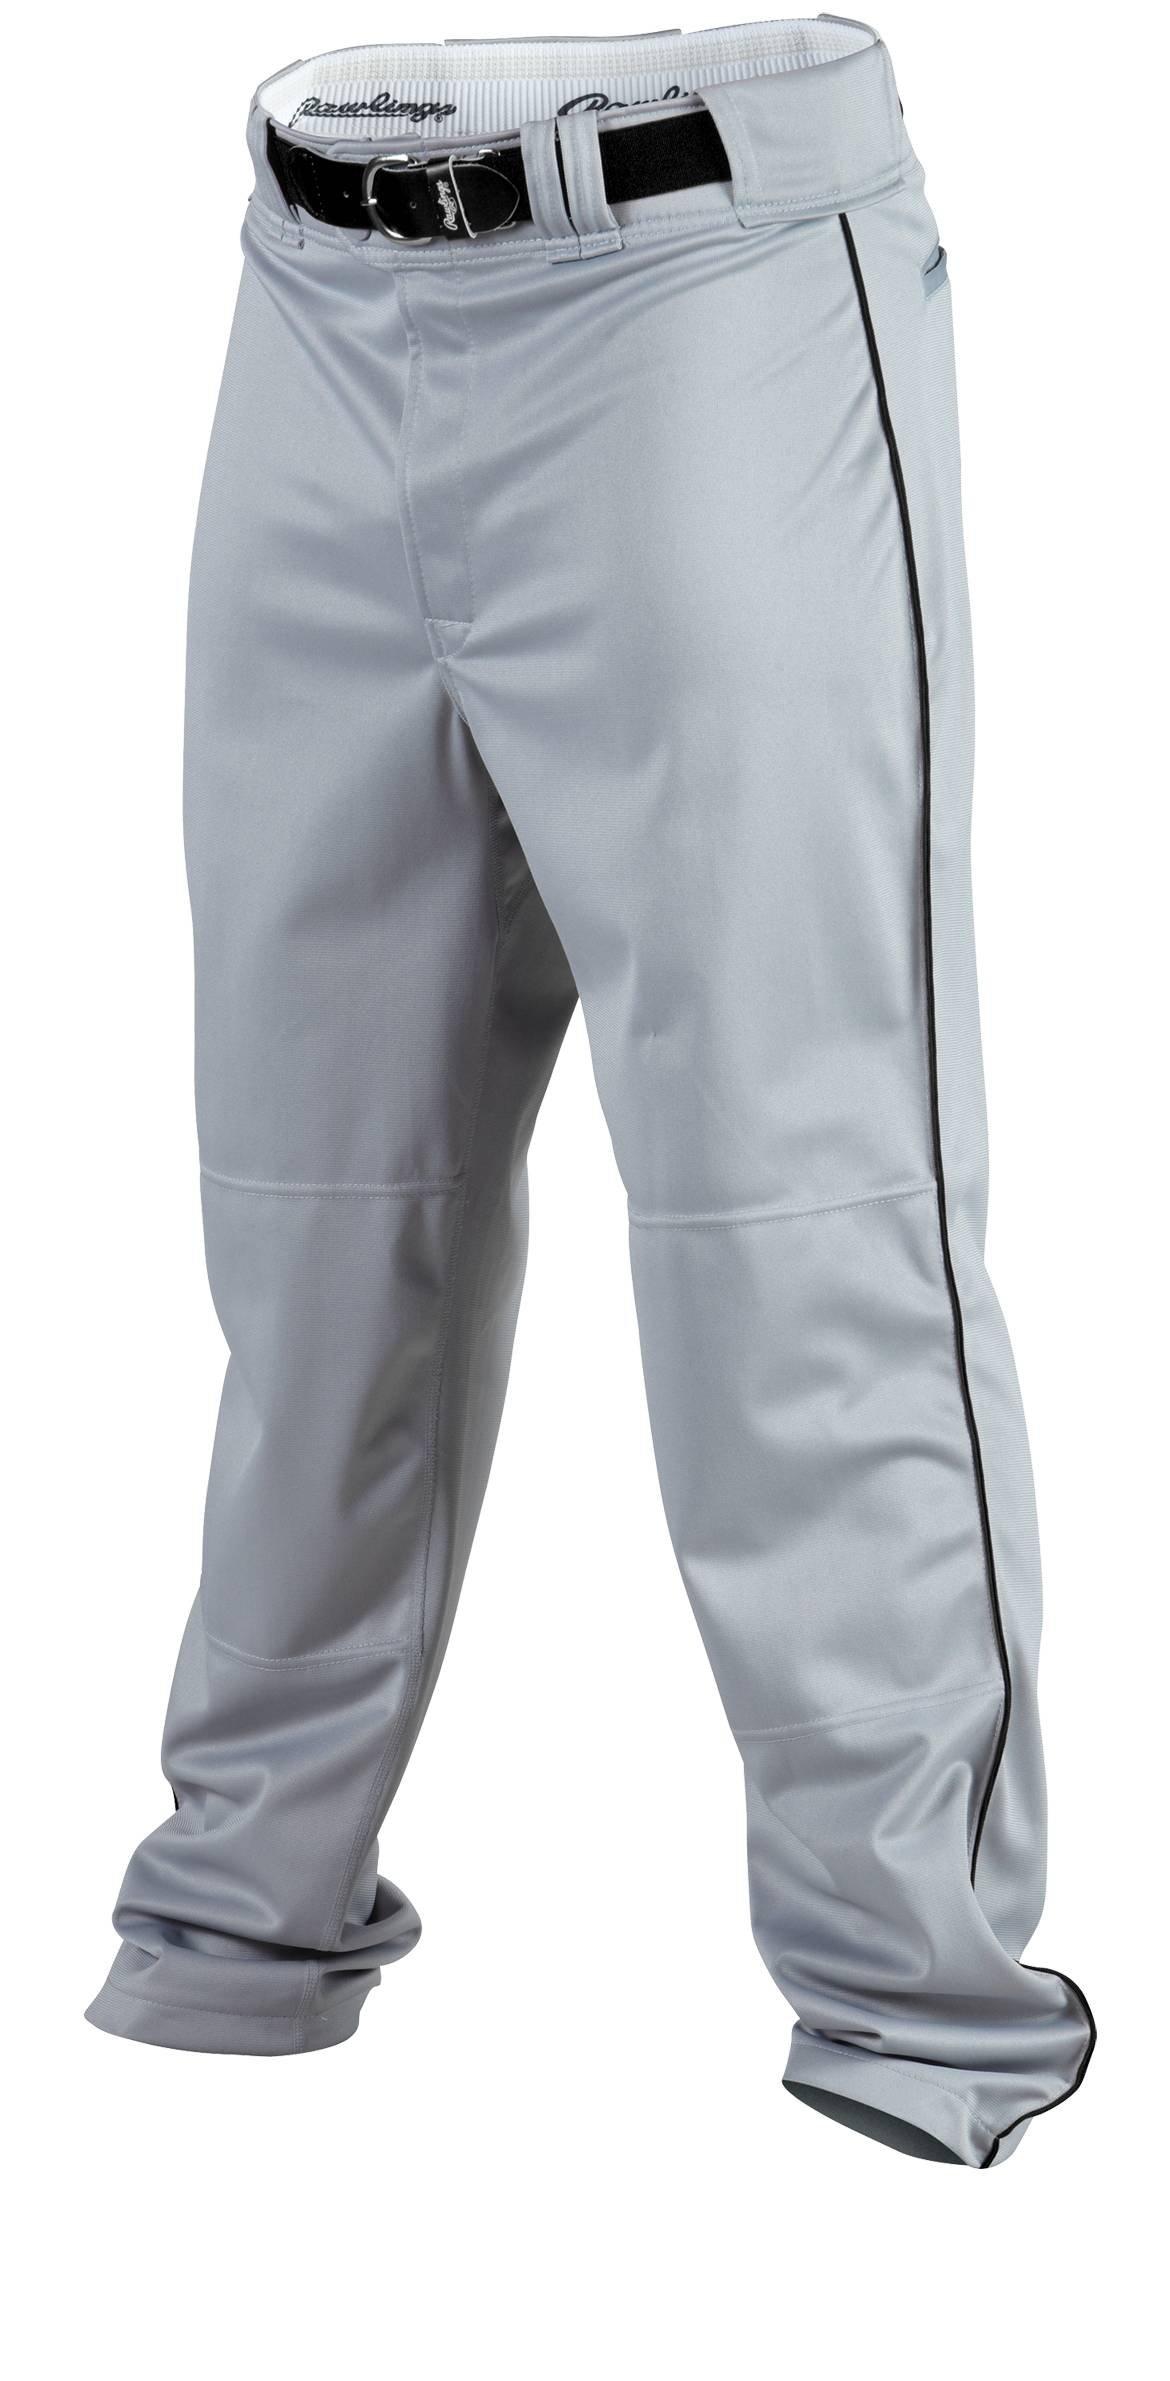 Rawlings Youth Baseball Pant (Blue Grey/Black, X-Large) by Rawlings